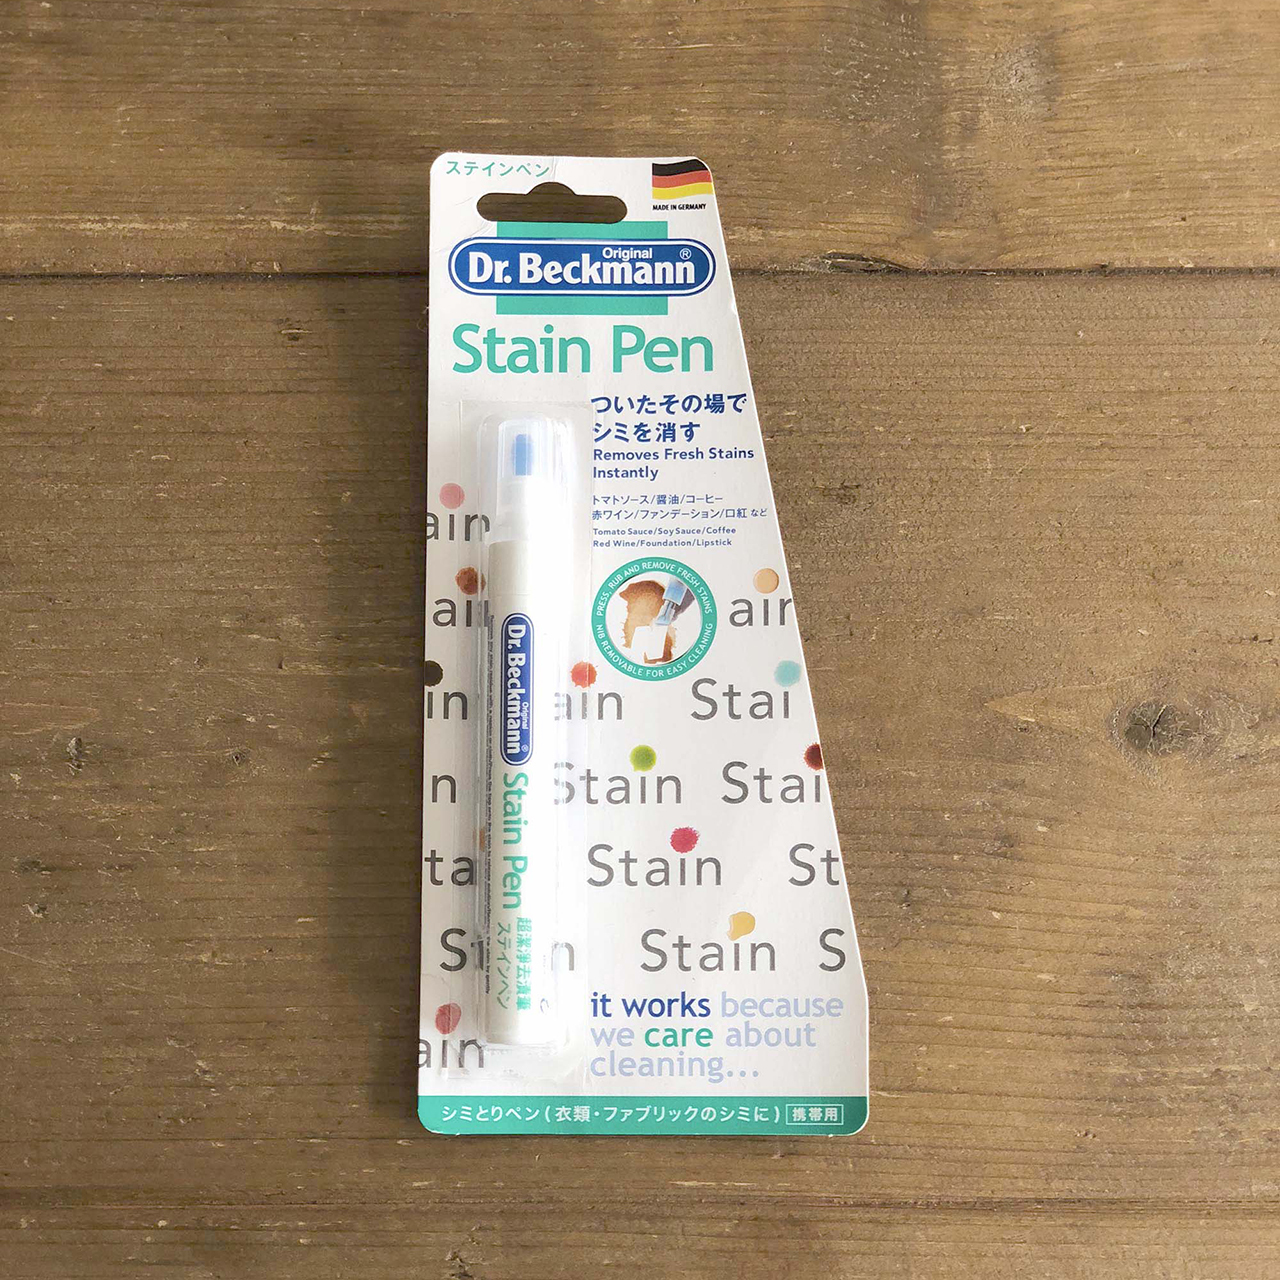 STAIN PEN / 携帯用シミとりペン 多目的タイプ